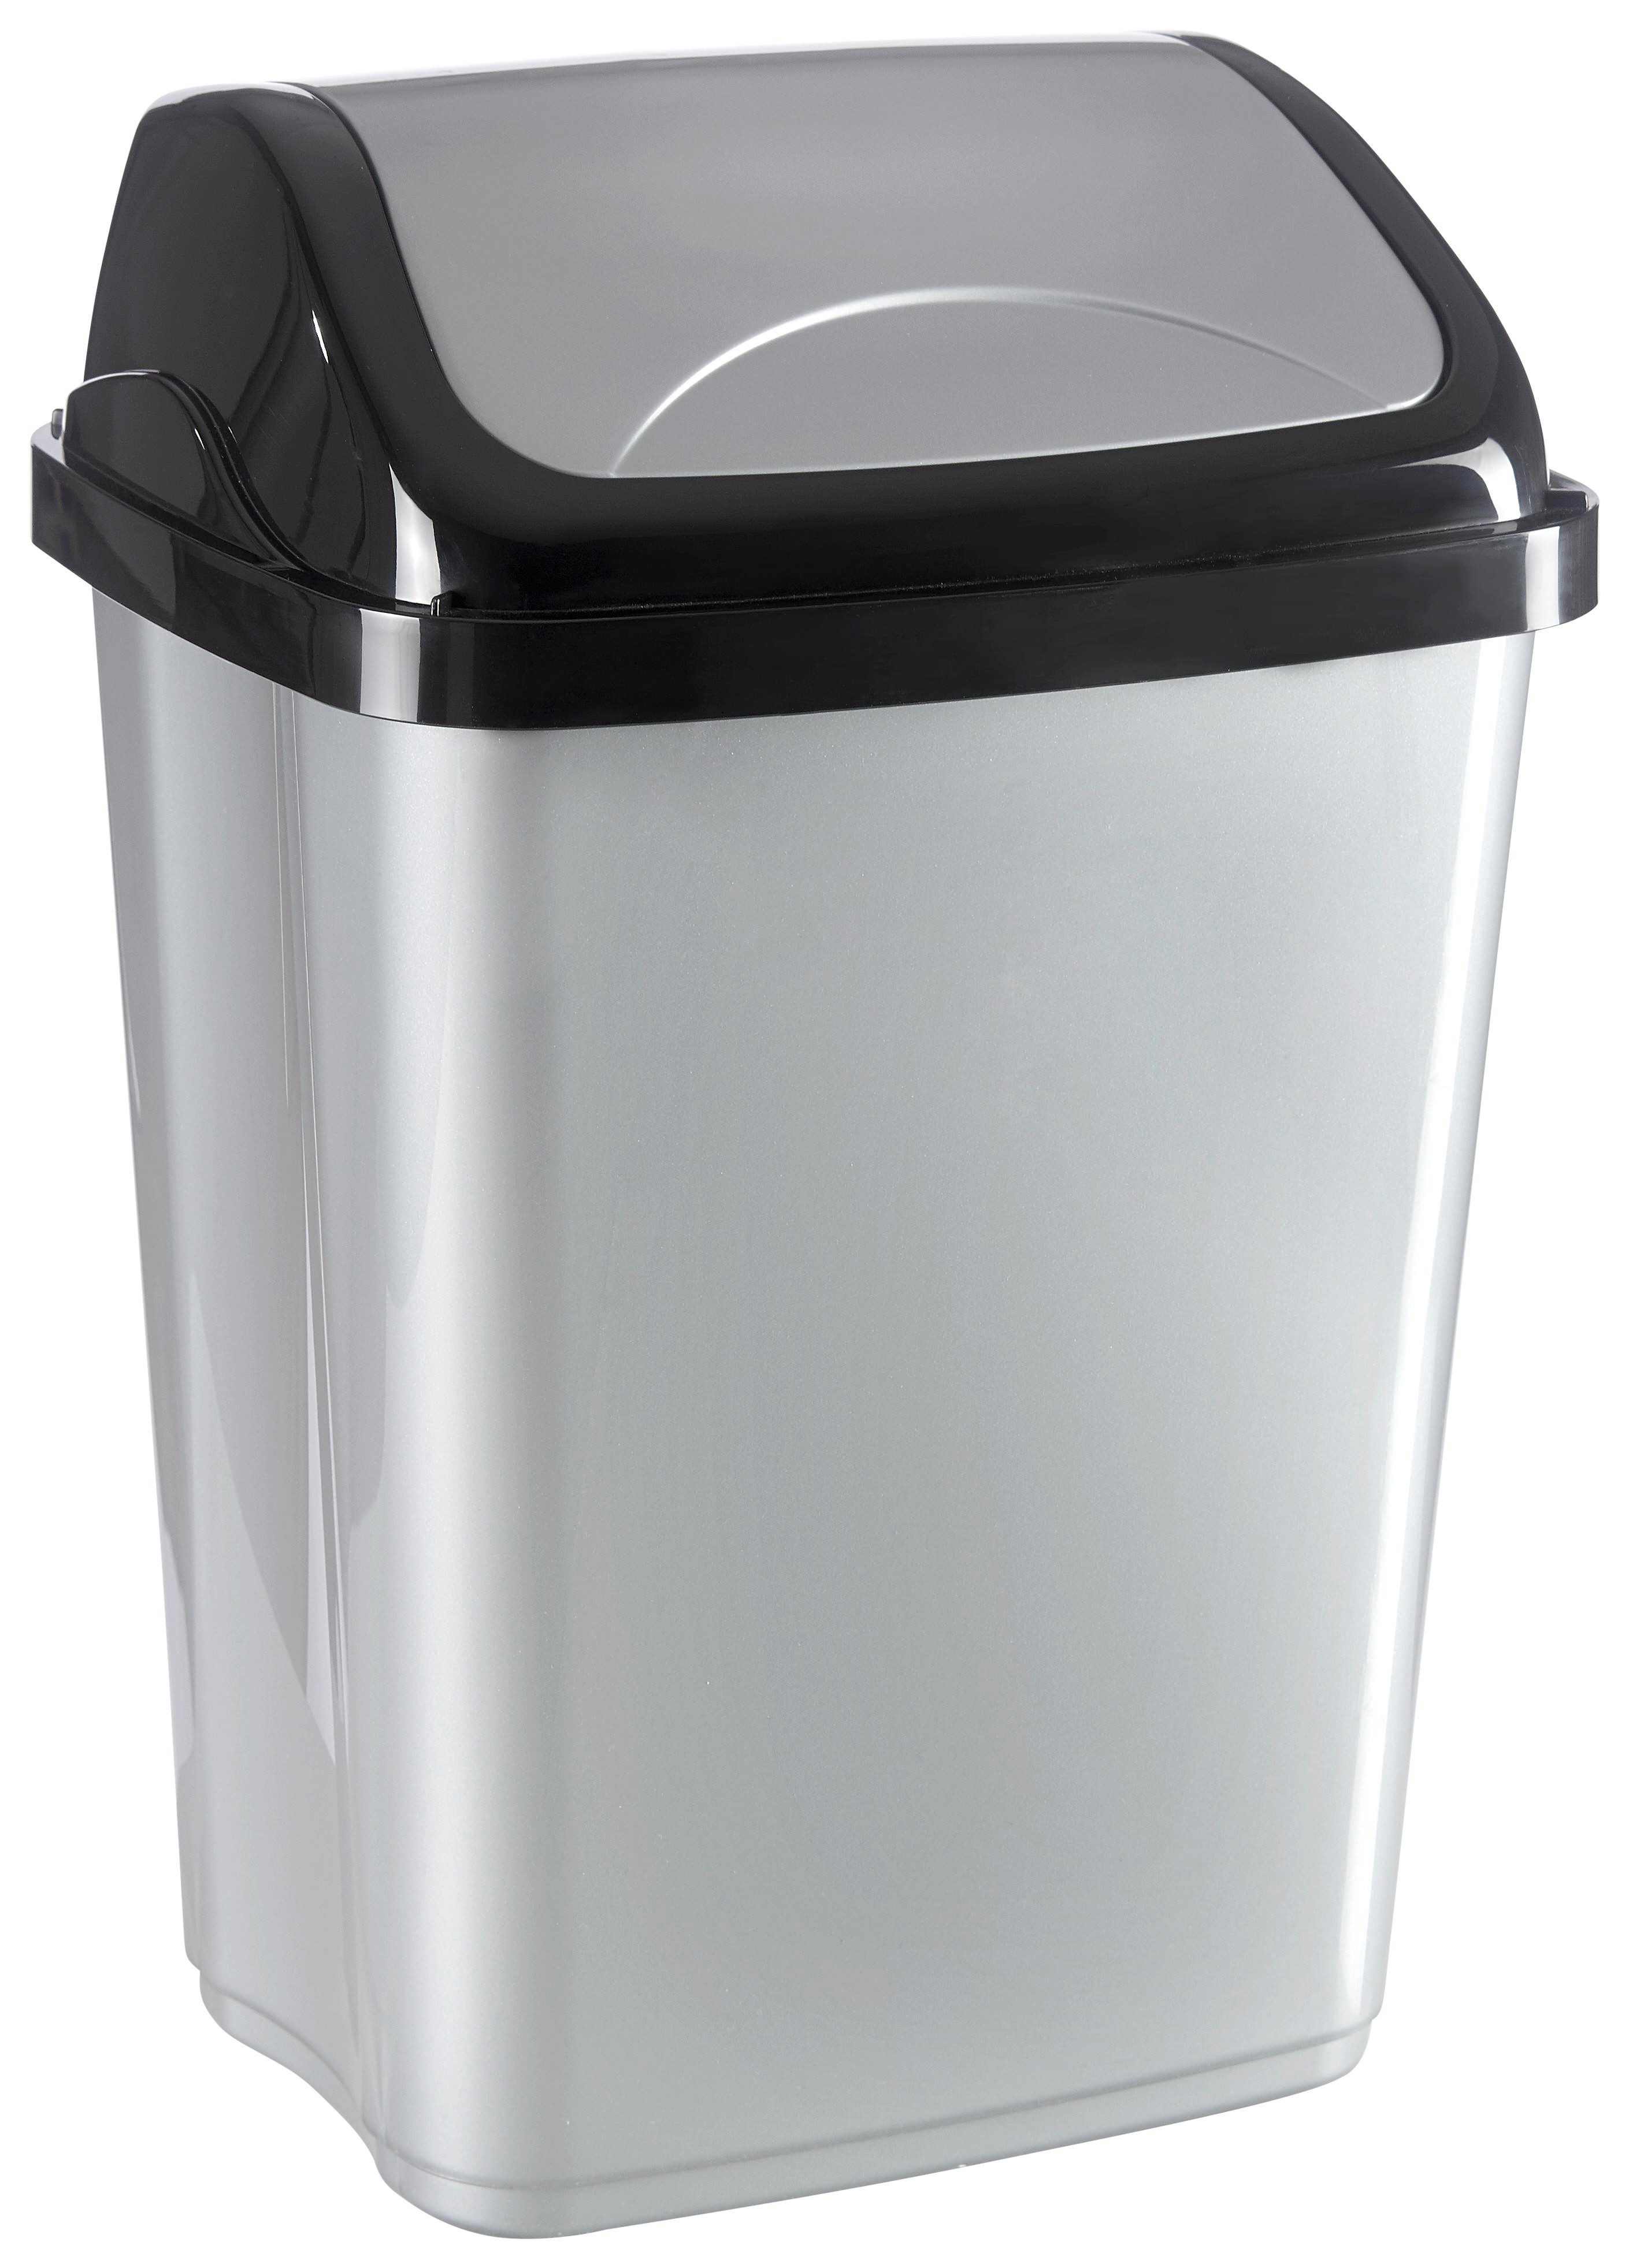 PAPPERSKORG MED VIPPLOCK - silver/svart, Basics, plast (19,5/25/37,5cm) - Homeware